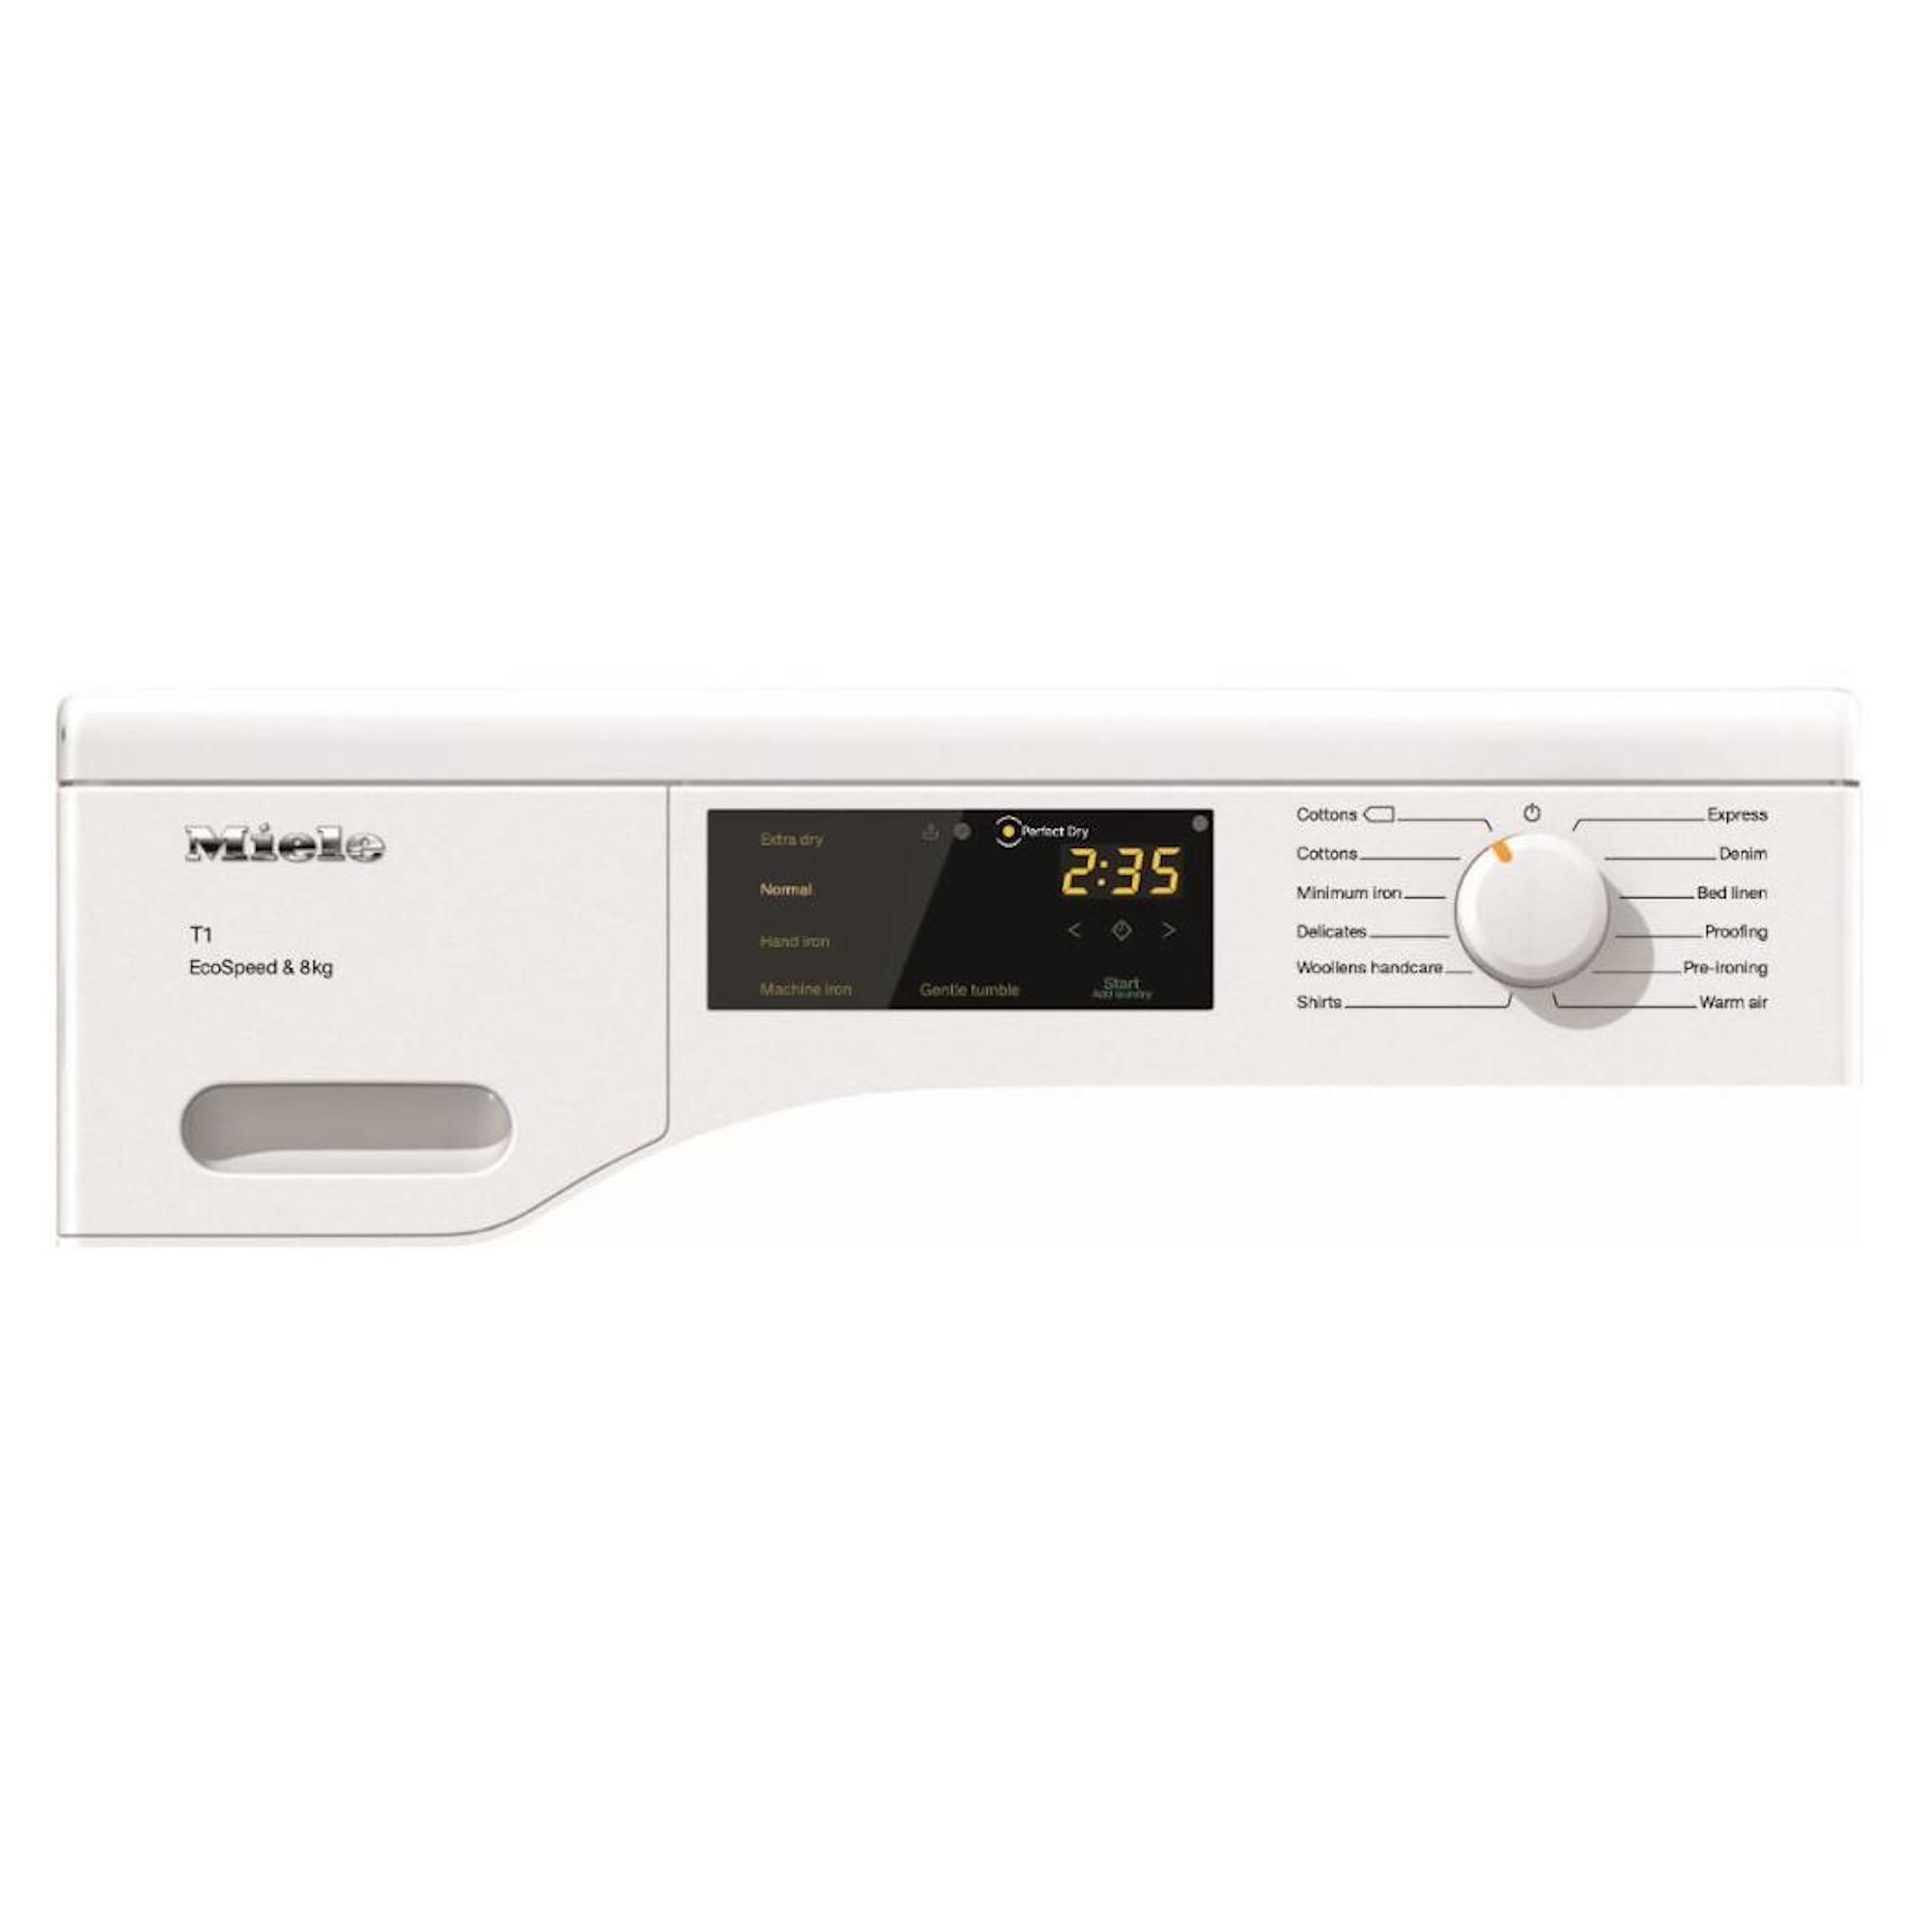 Miele TCB140WP 7kg Heat Pump Dryer with LED Lighting